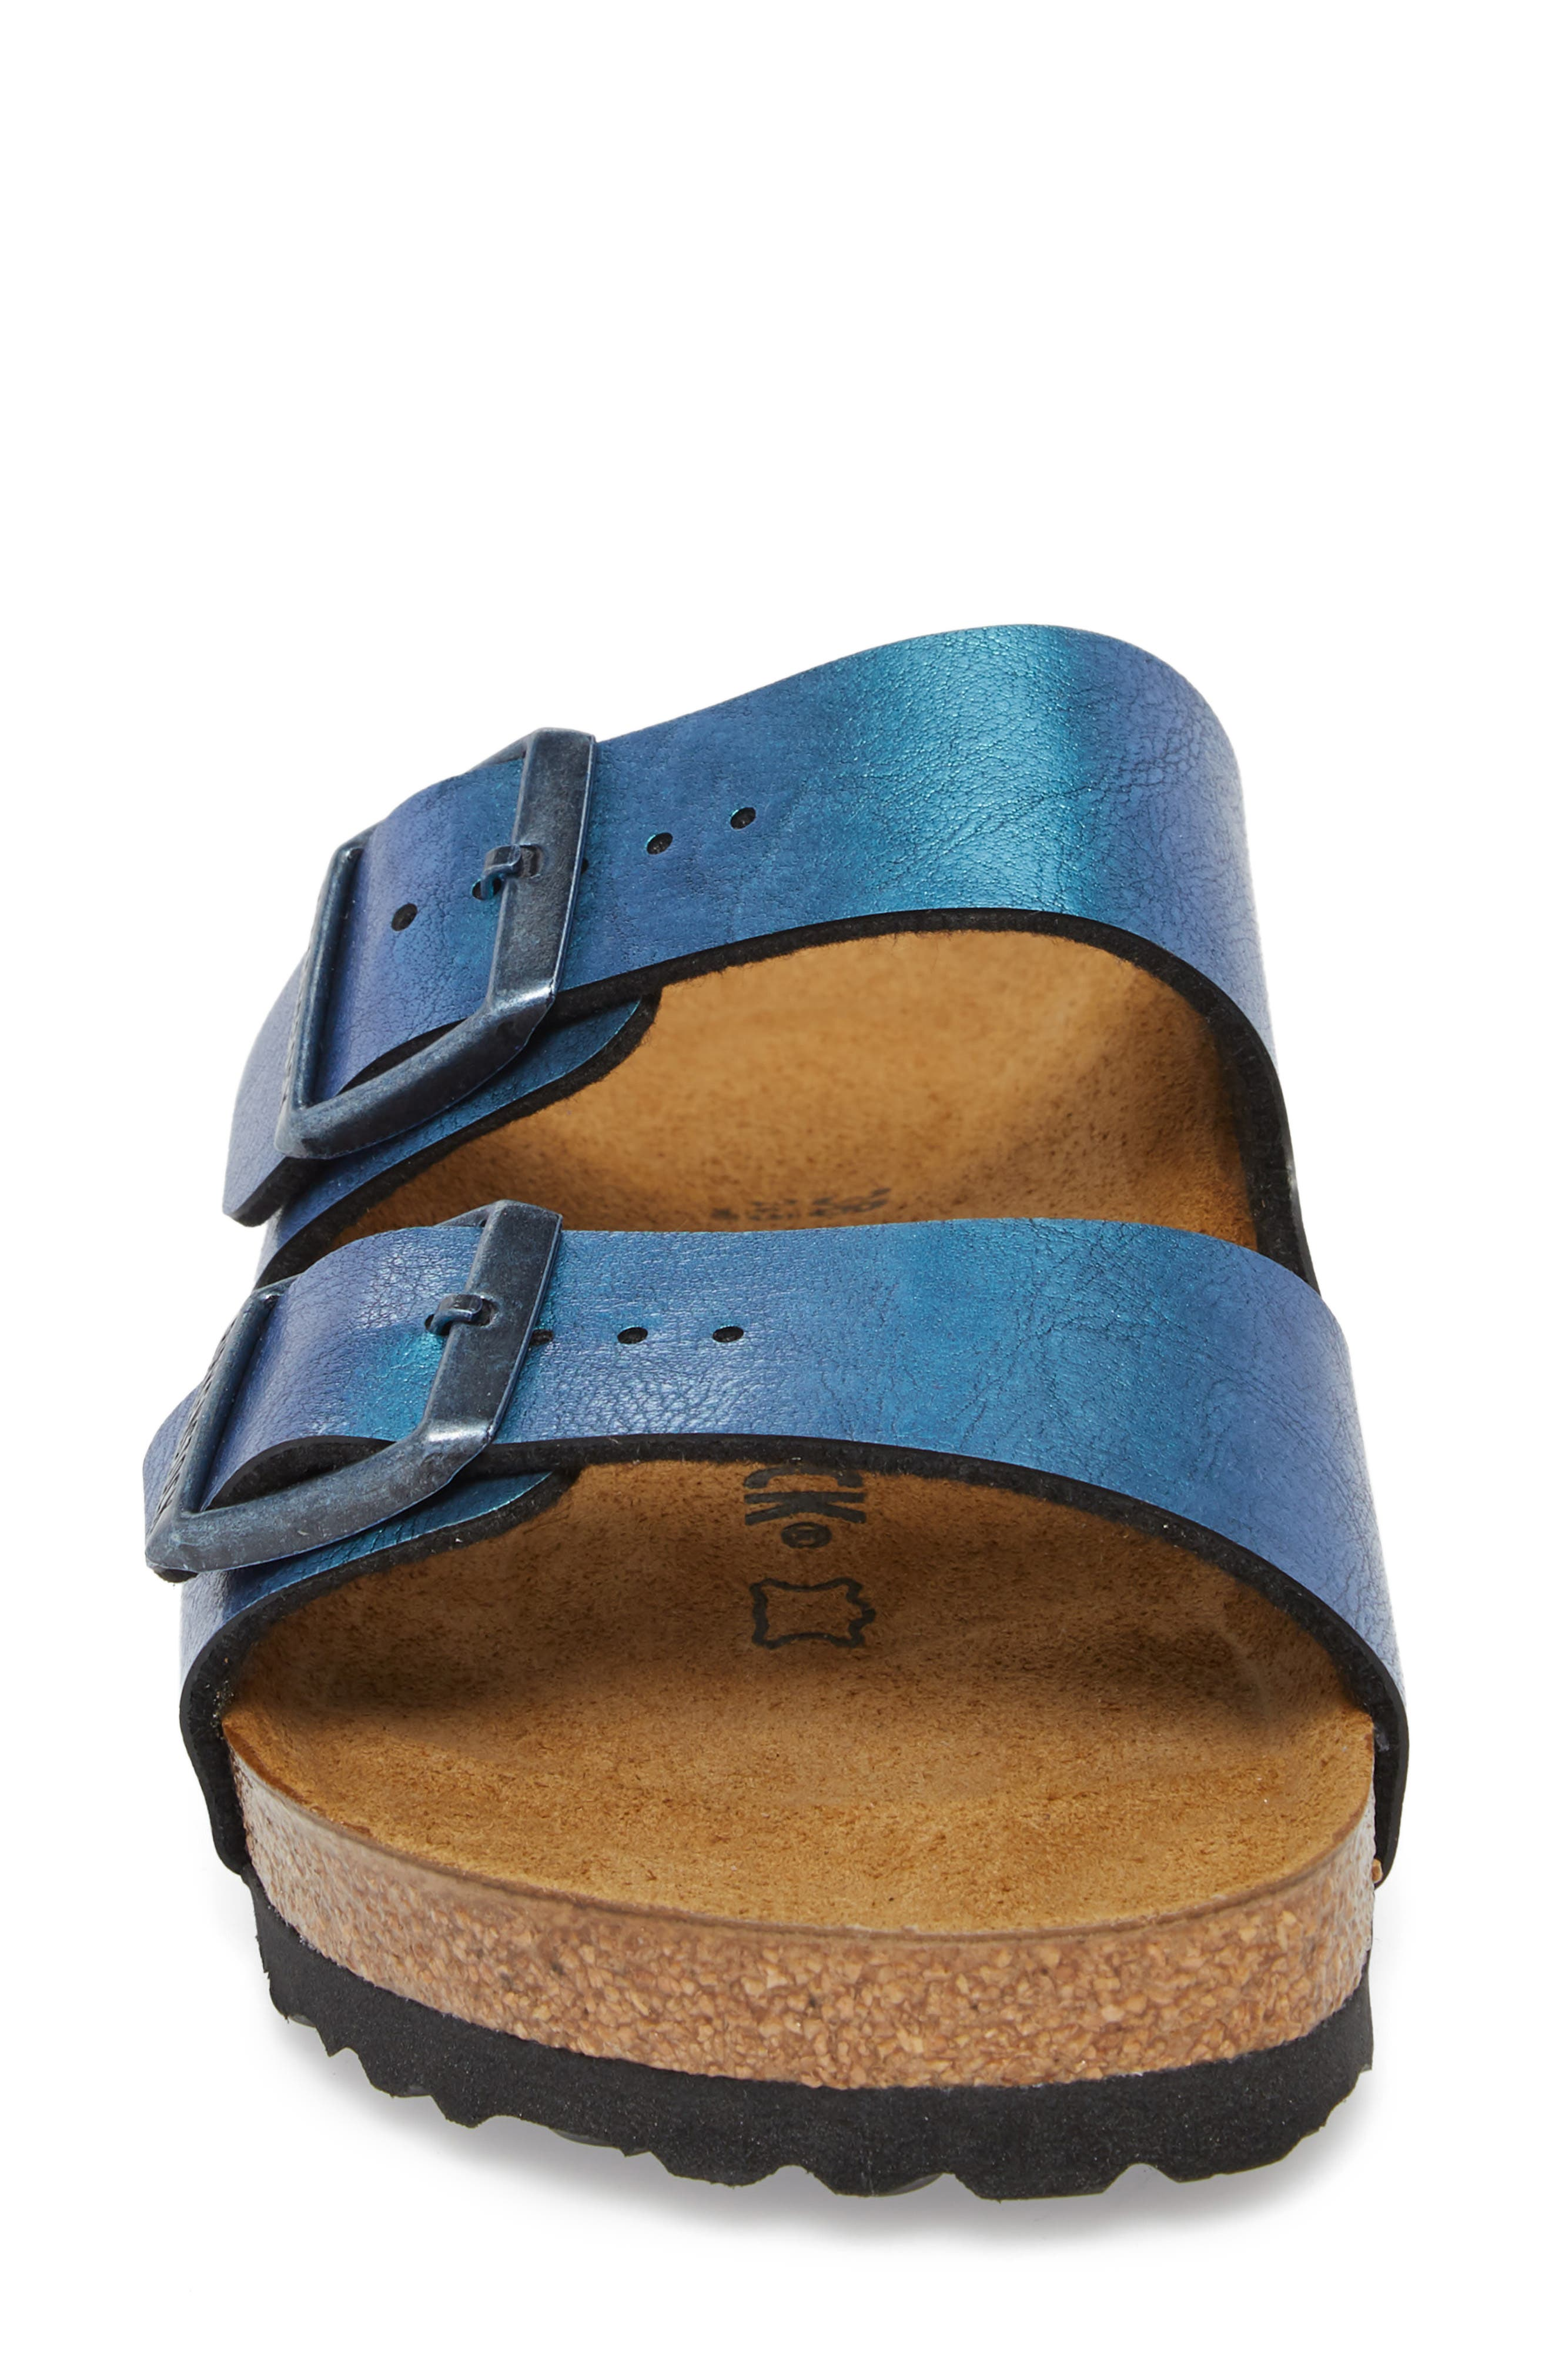 Arizona Graceful Birko-Flor<sup>™</sup> Sandal,                             Alternate thumbnail 4, color,                             Blue